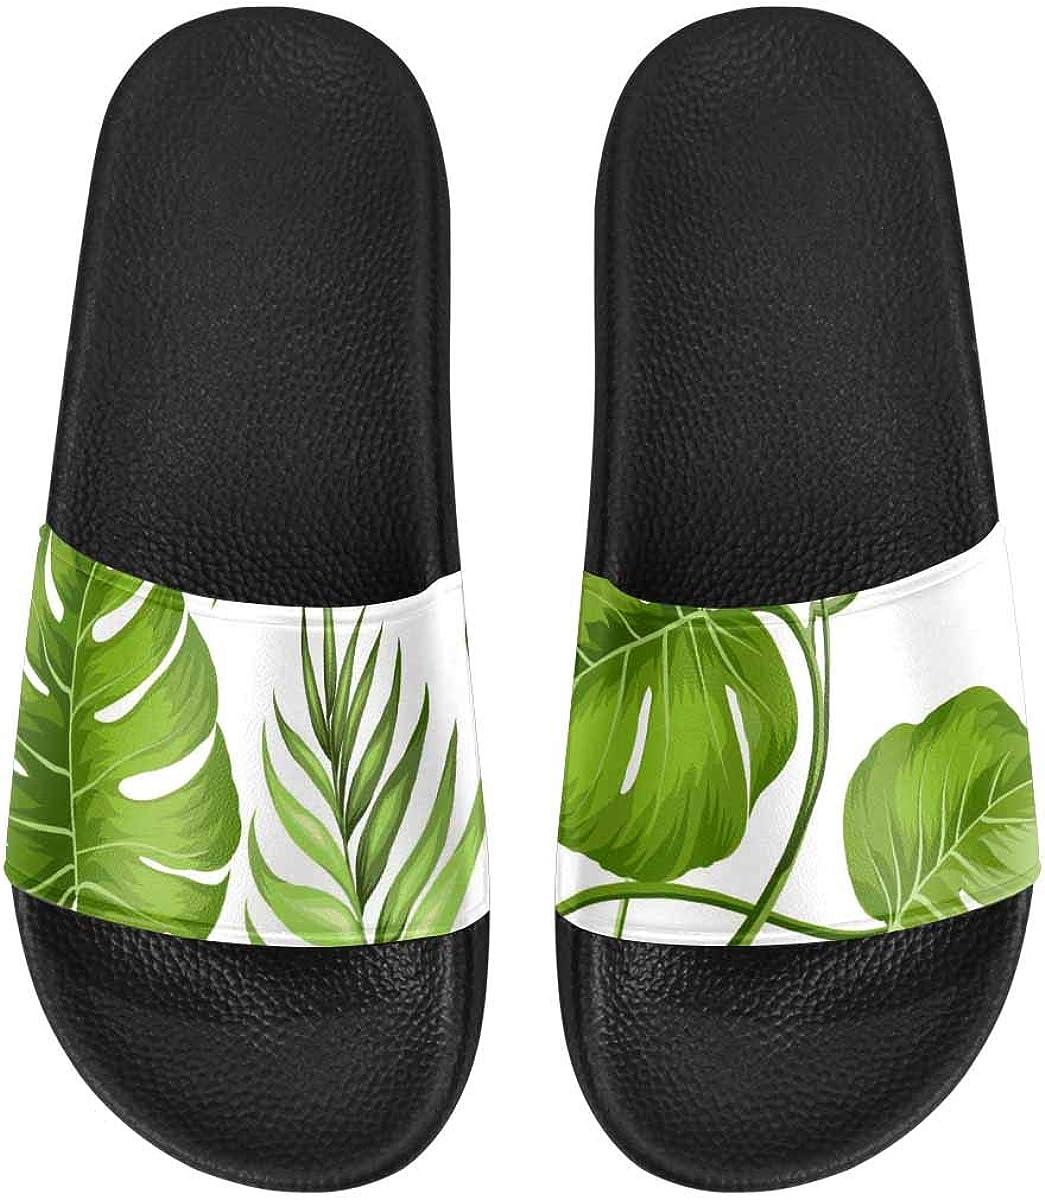 InterestPrint Women's Casual Slide Sandals for Indoor Outdoor Skull and Flower of The Dead